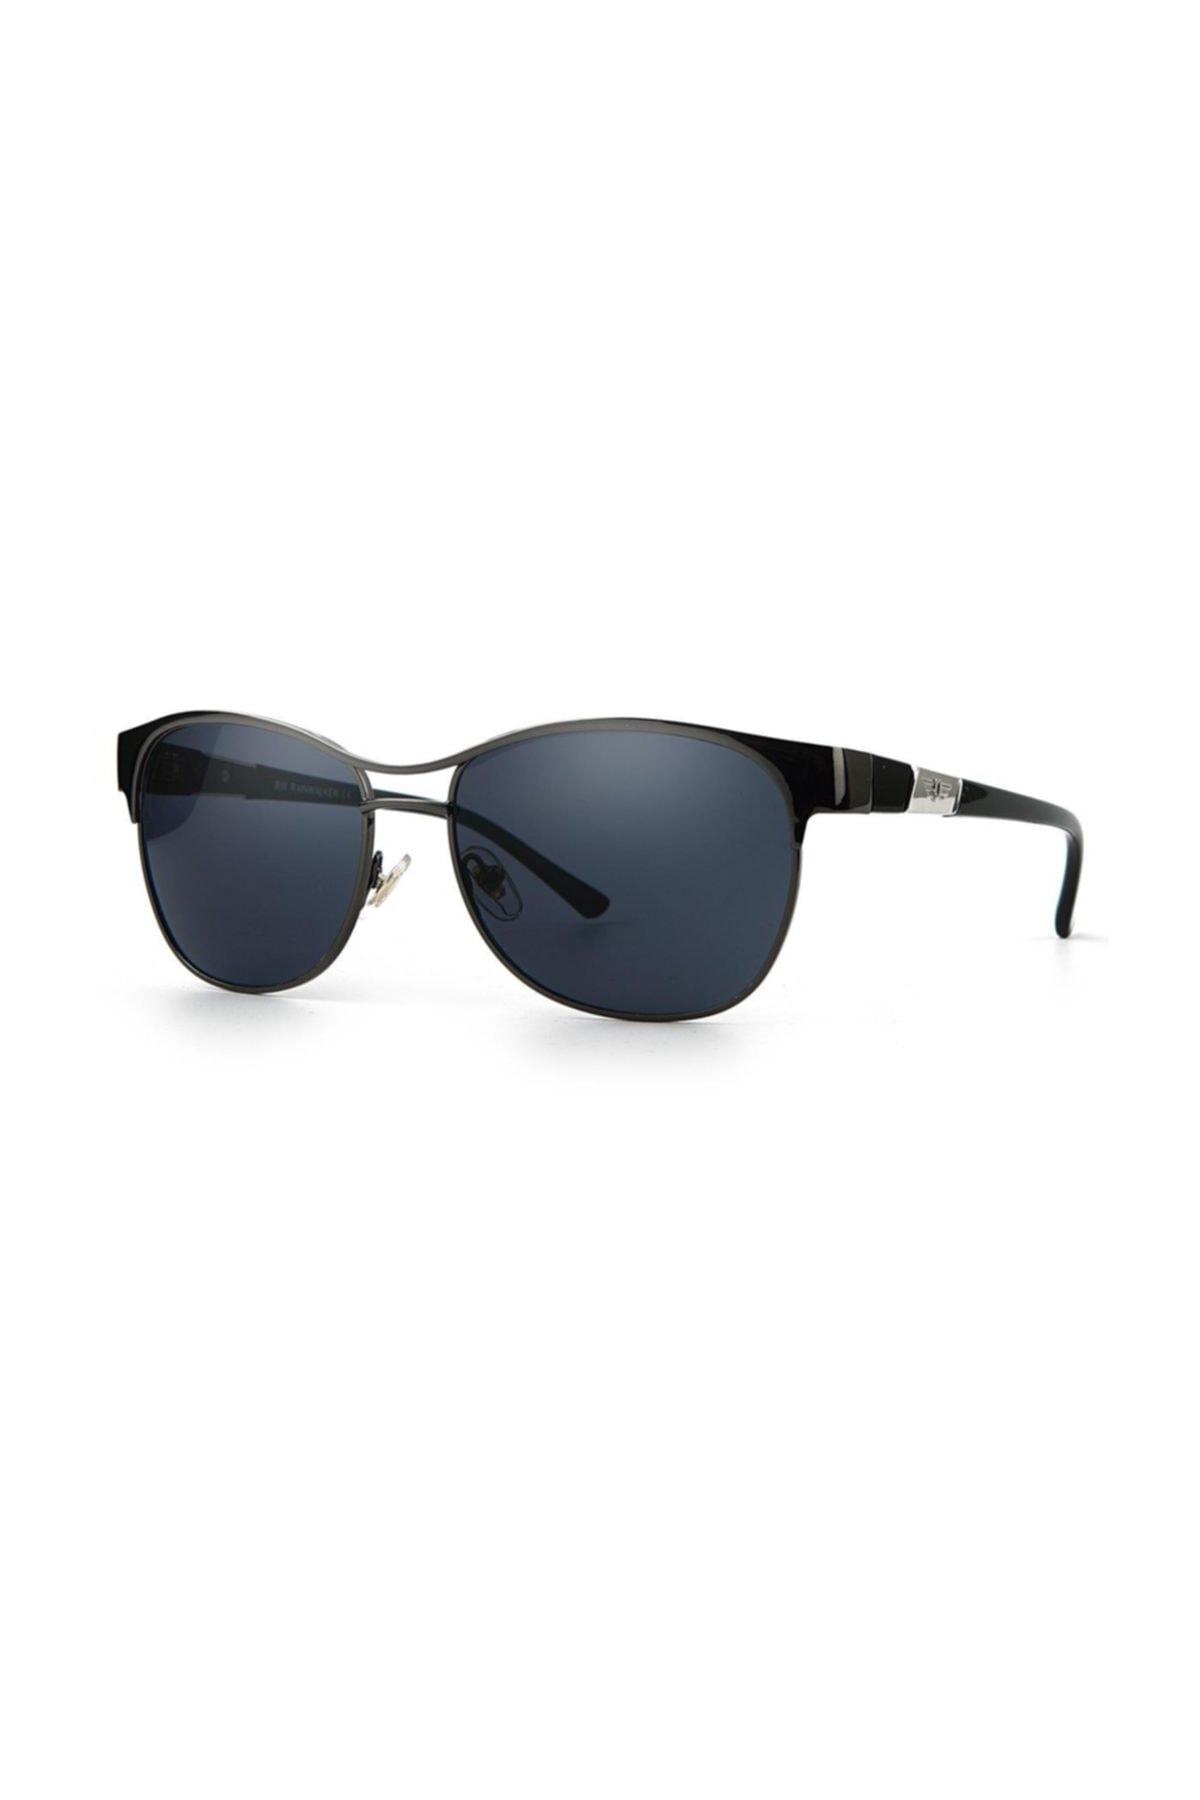 عینک آفتابی زنانه پارچه  برند Rainwalker رنگ مشکی کد ty7060685